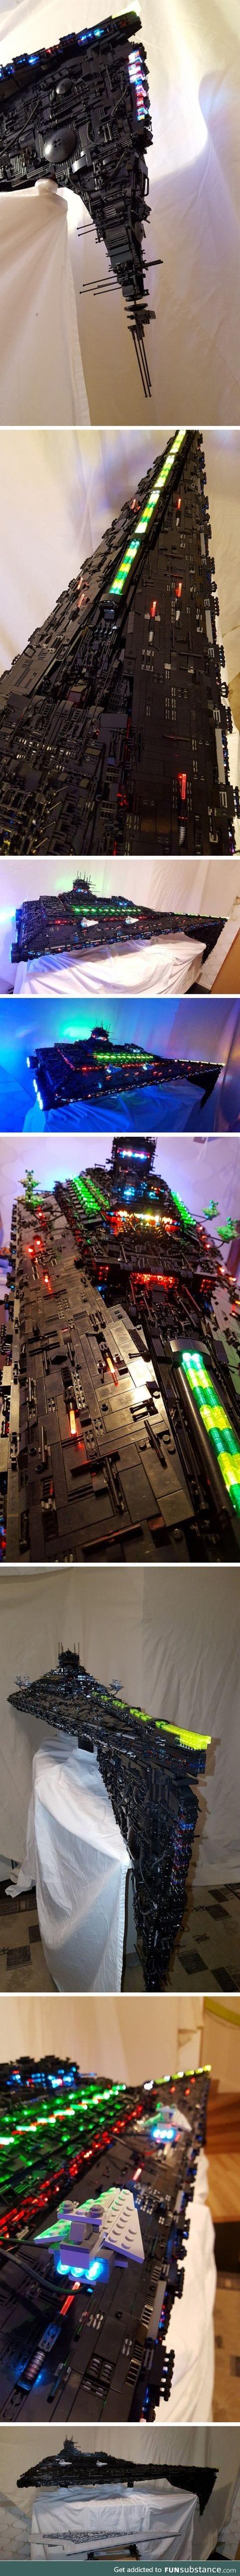 Lego: Eclipse class dreadnought